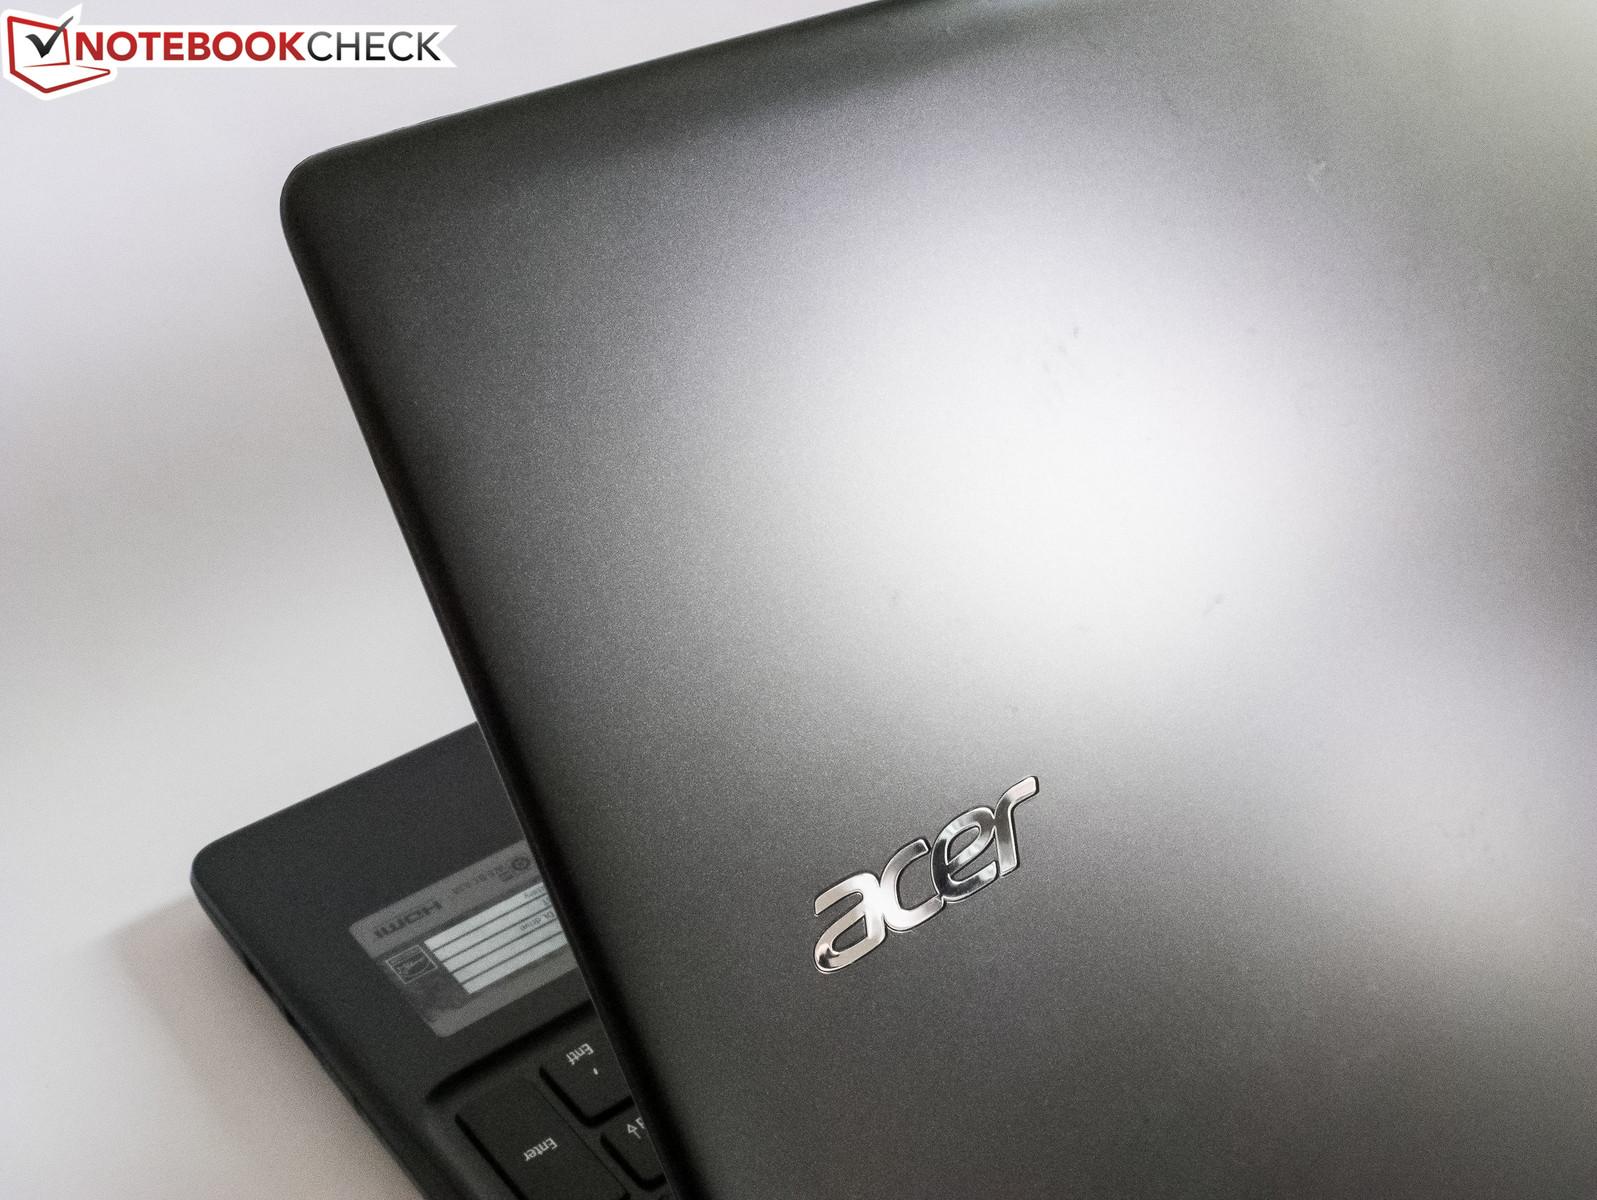 Acer Aspire E1-522 Realtek HD Audio Windows 8 X64